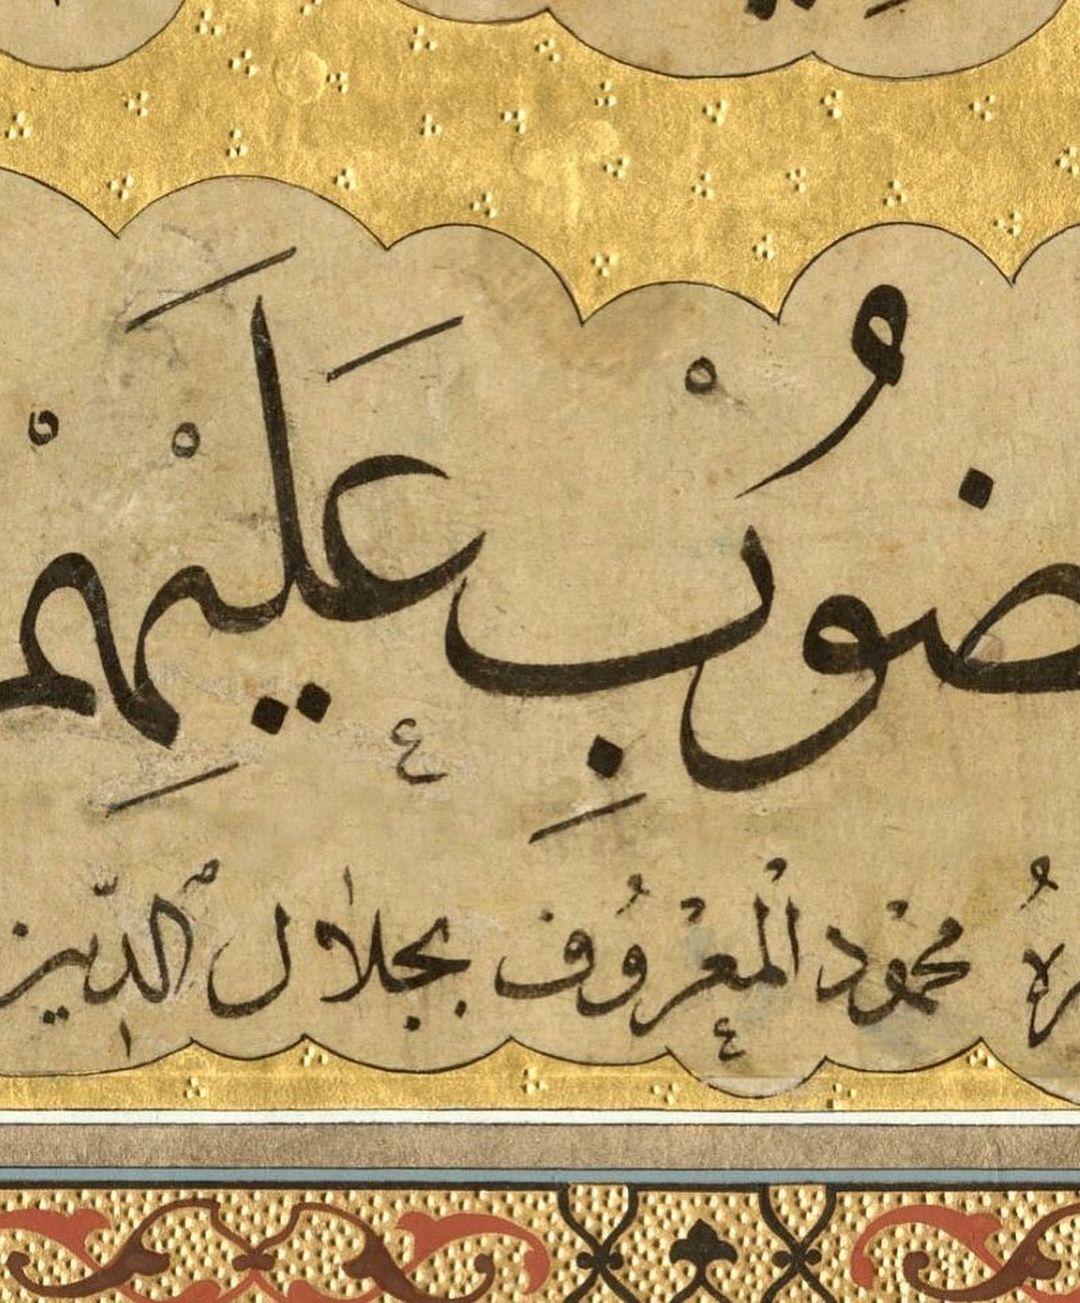 Apk Website For Arabic Calligraphy بِسْمِ اللّٰهِ الرَّحْمٰنِ الرَّح۪يمِ اَلْحَمْدُ لِلّٰهِ رَبِّ الْـعَالَم۪ينَۙ ا... 1441 8